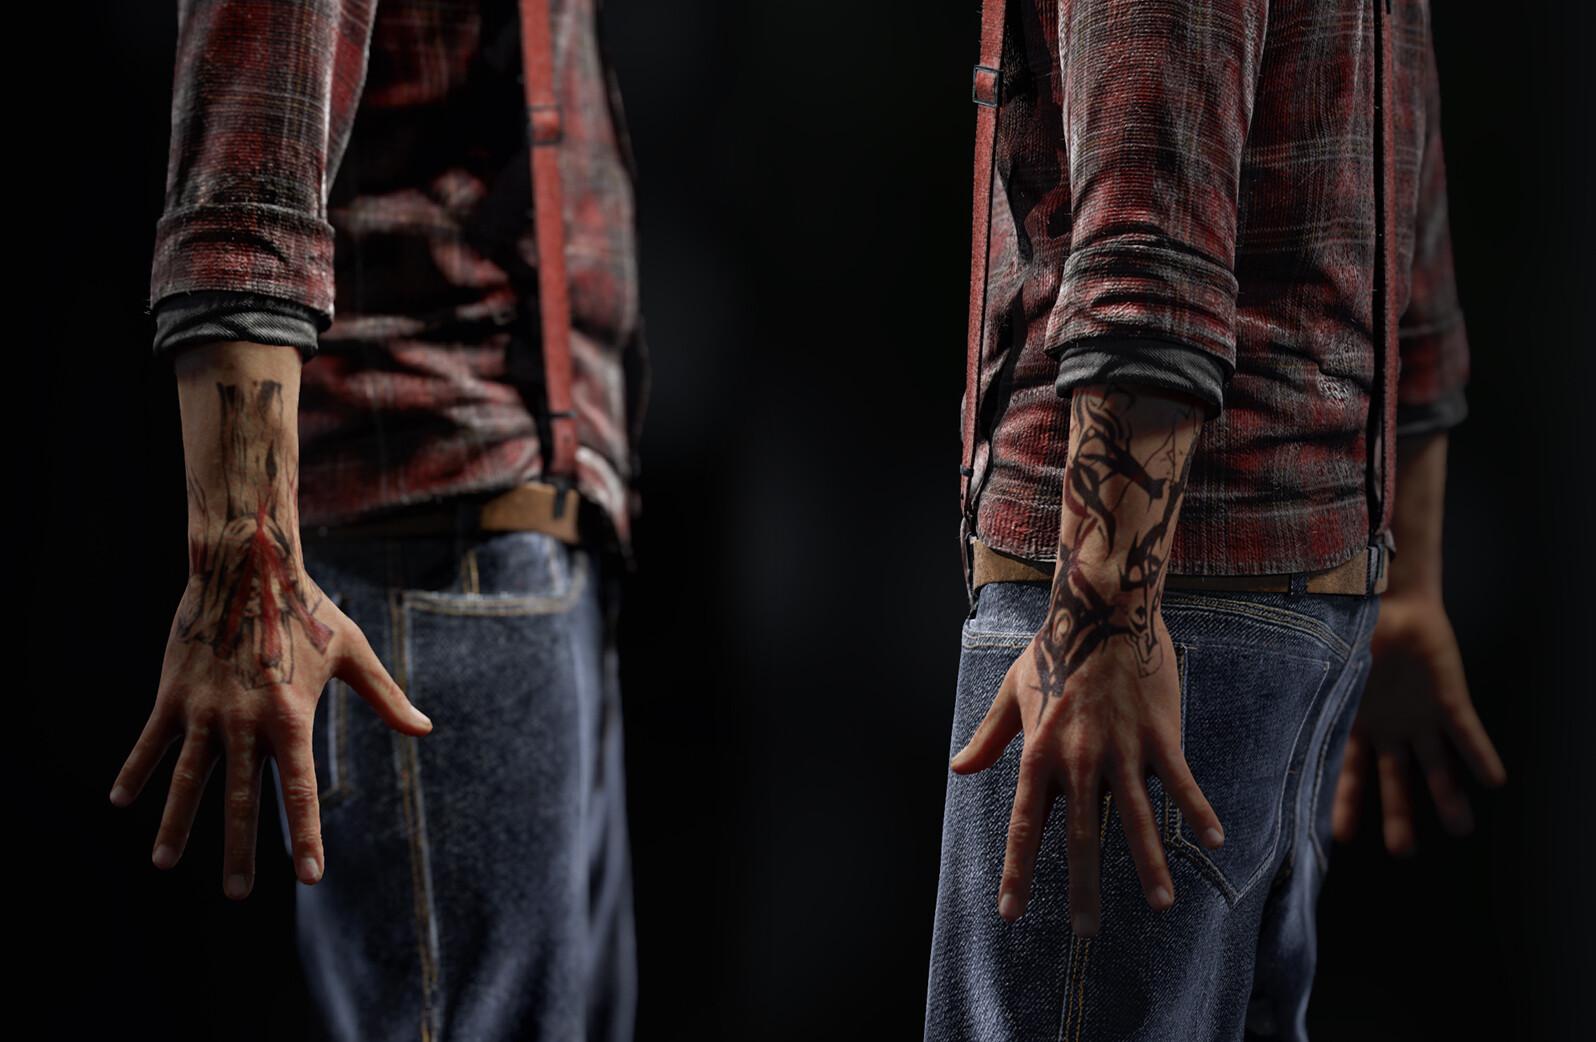 Antone magdy hands